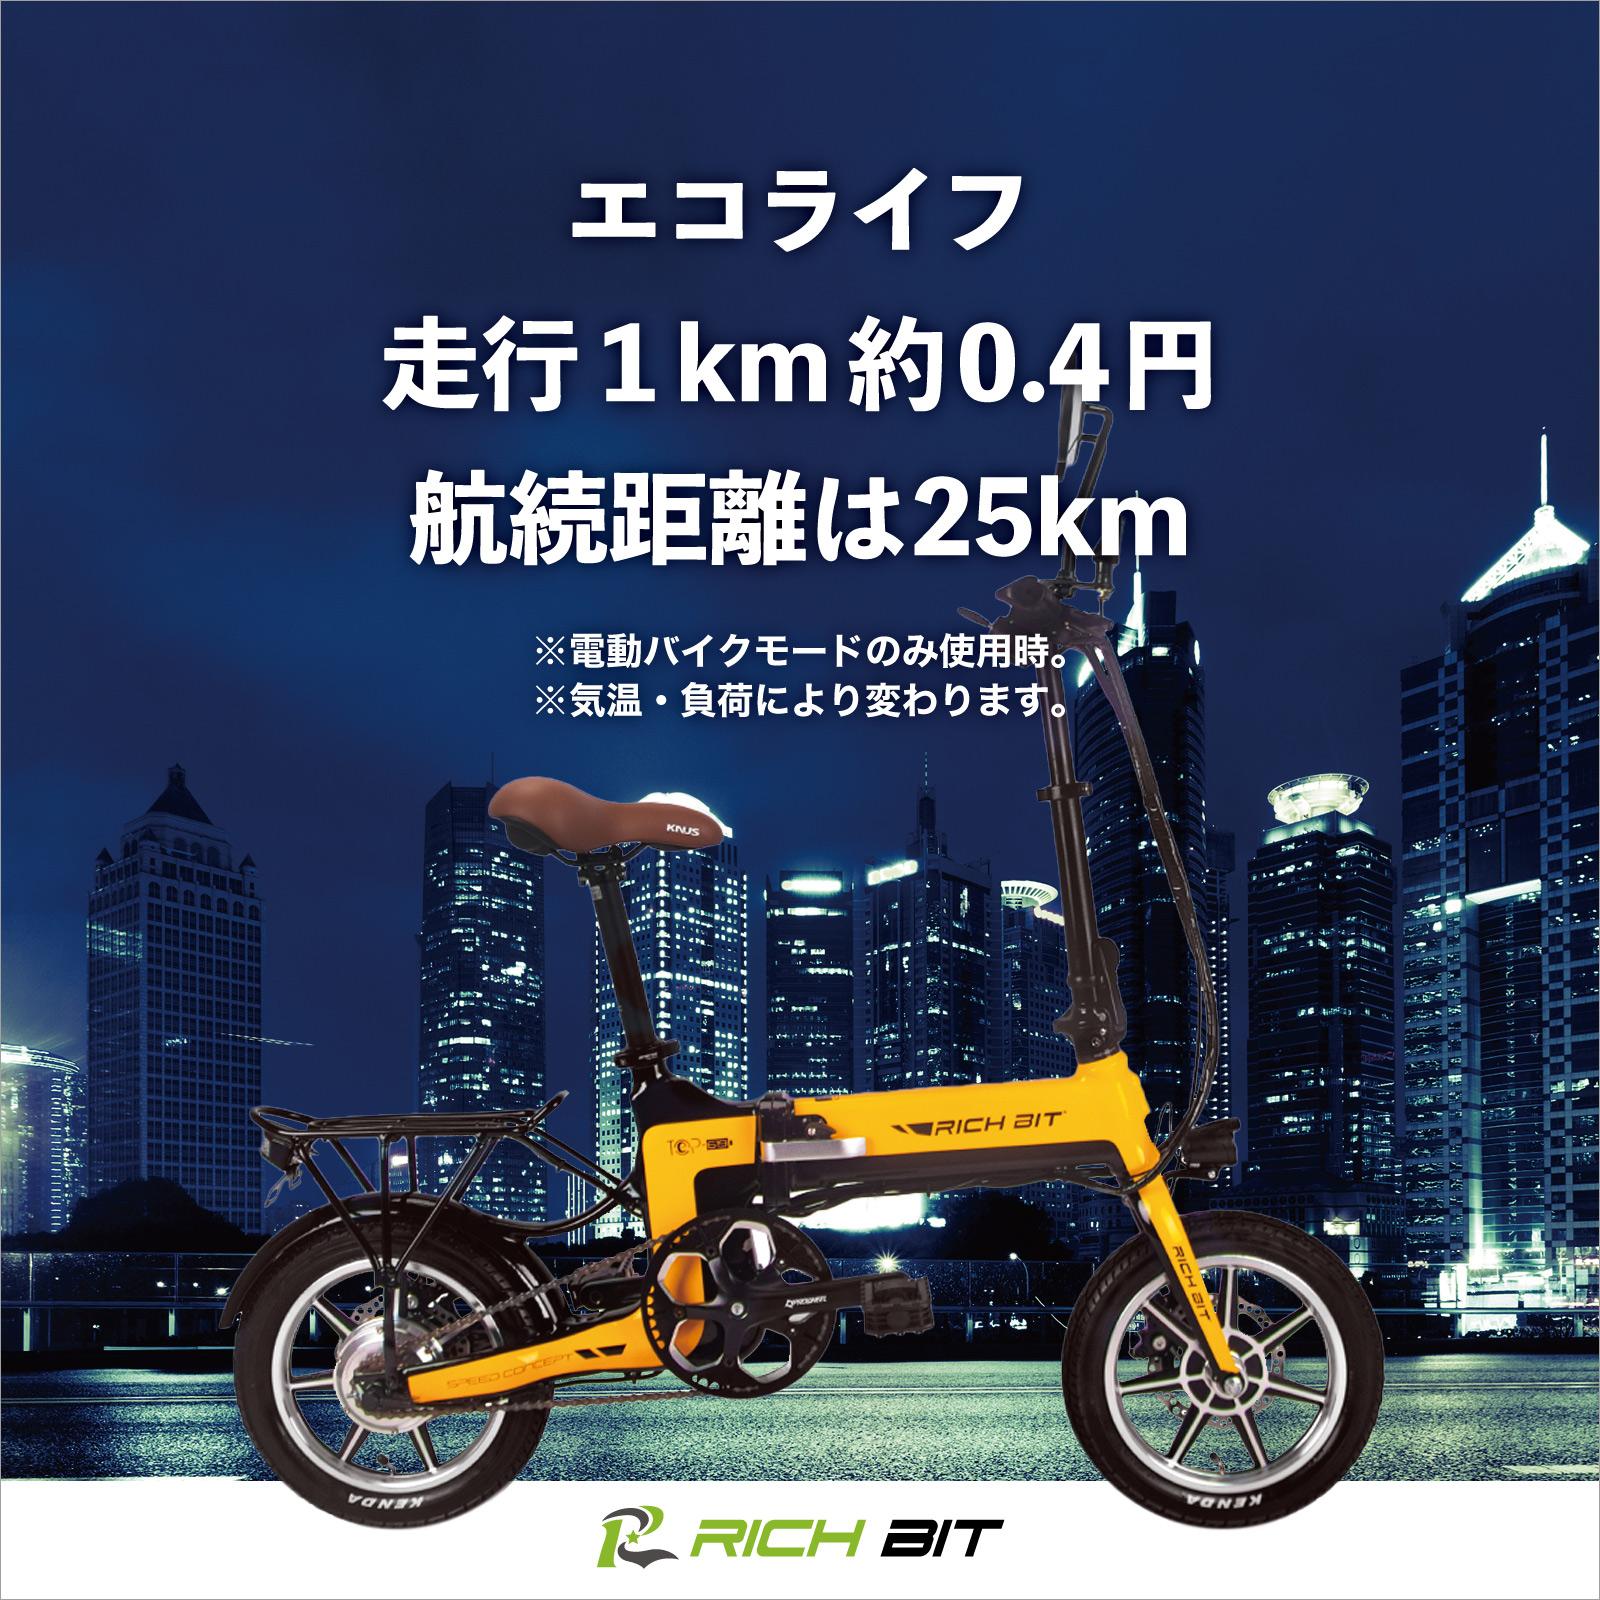 RICHBIT Smart eBike TOP619 公道仕様 電動バイク 電動スクーター 原付 折り畳み 公道 街乗り 通勤 通学 配達 デリバリー